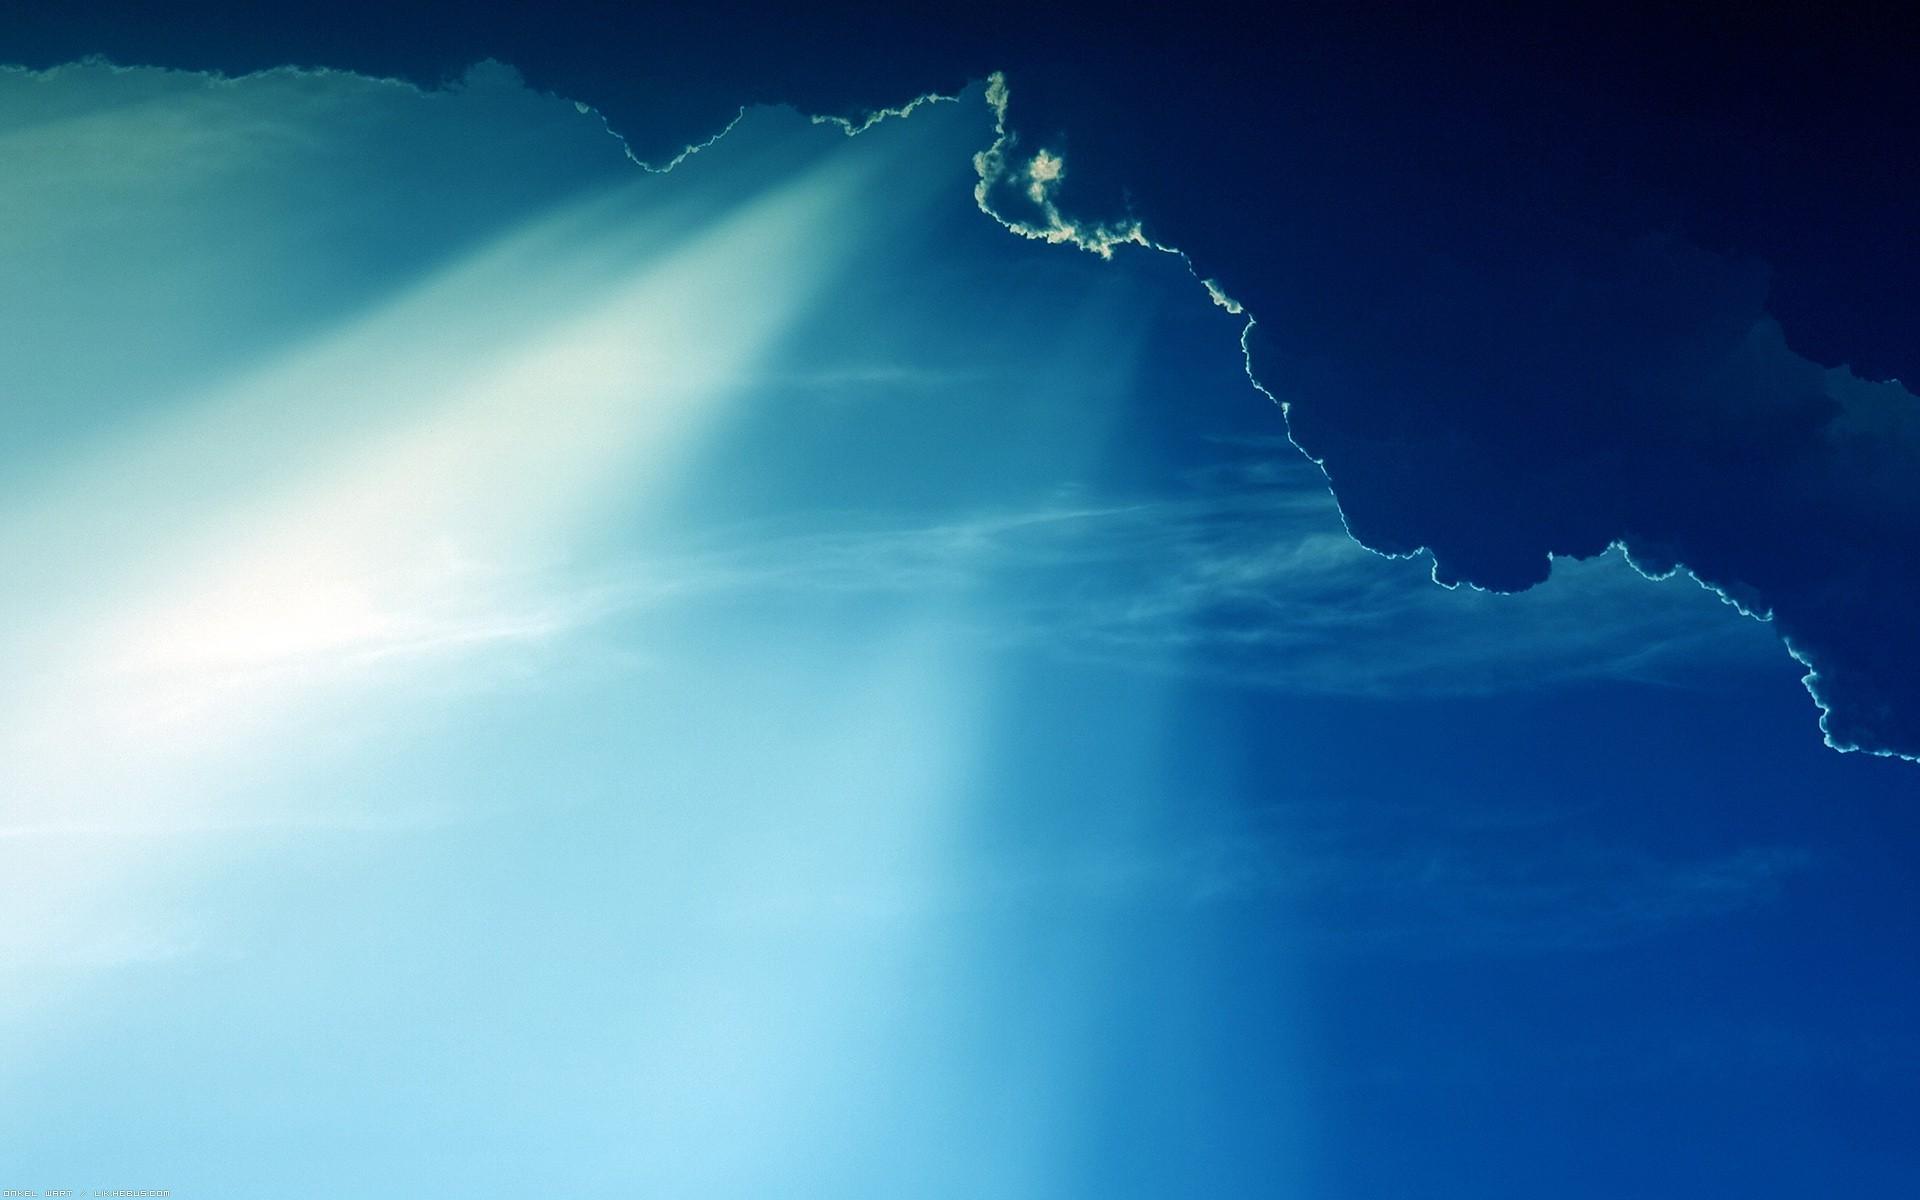 Wallpaper Sunlight Sky Clouds Blue Sun Rays Horizon